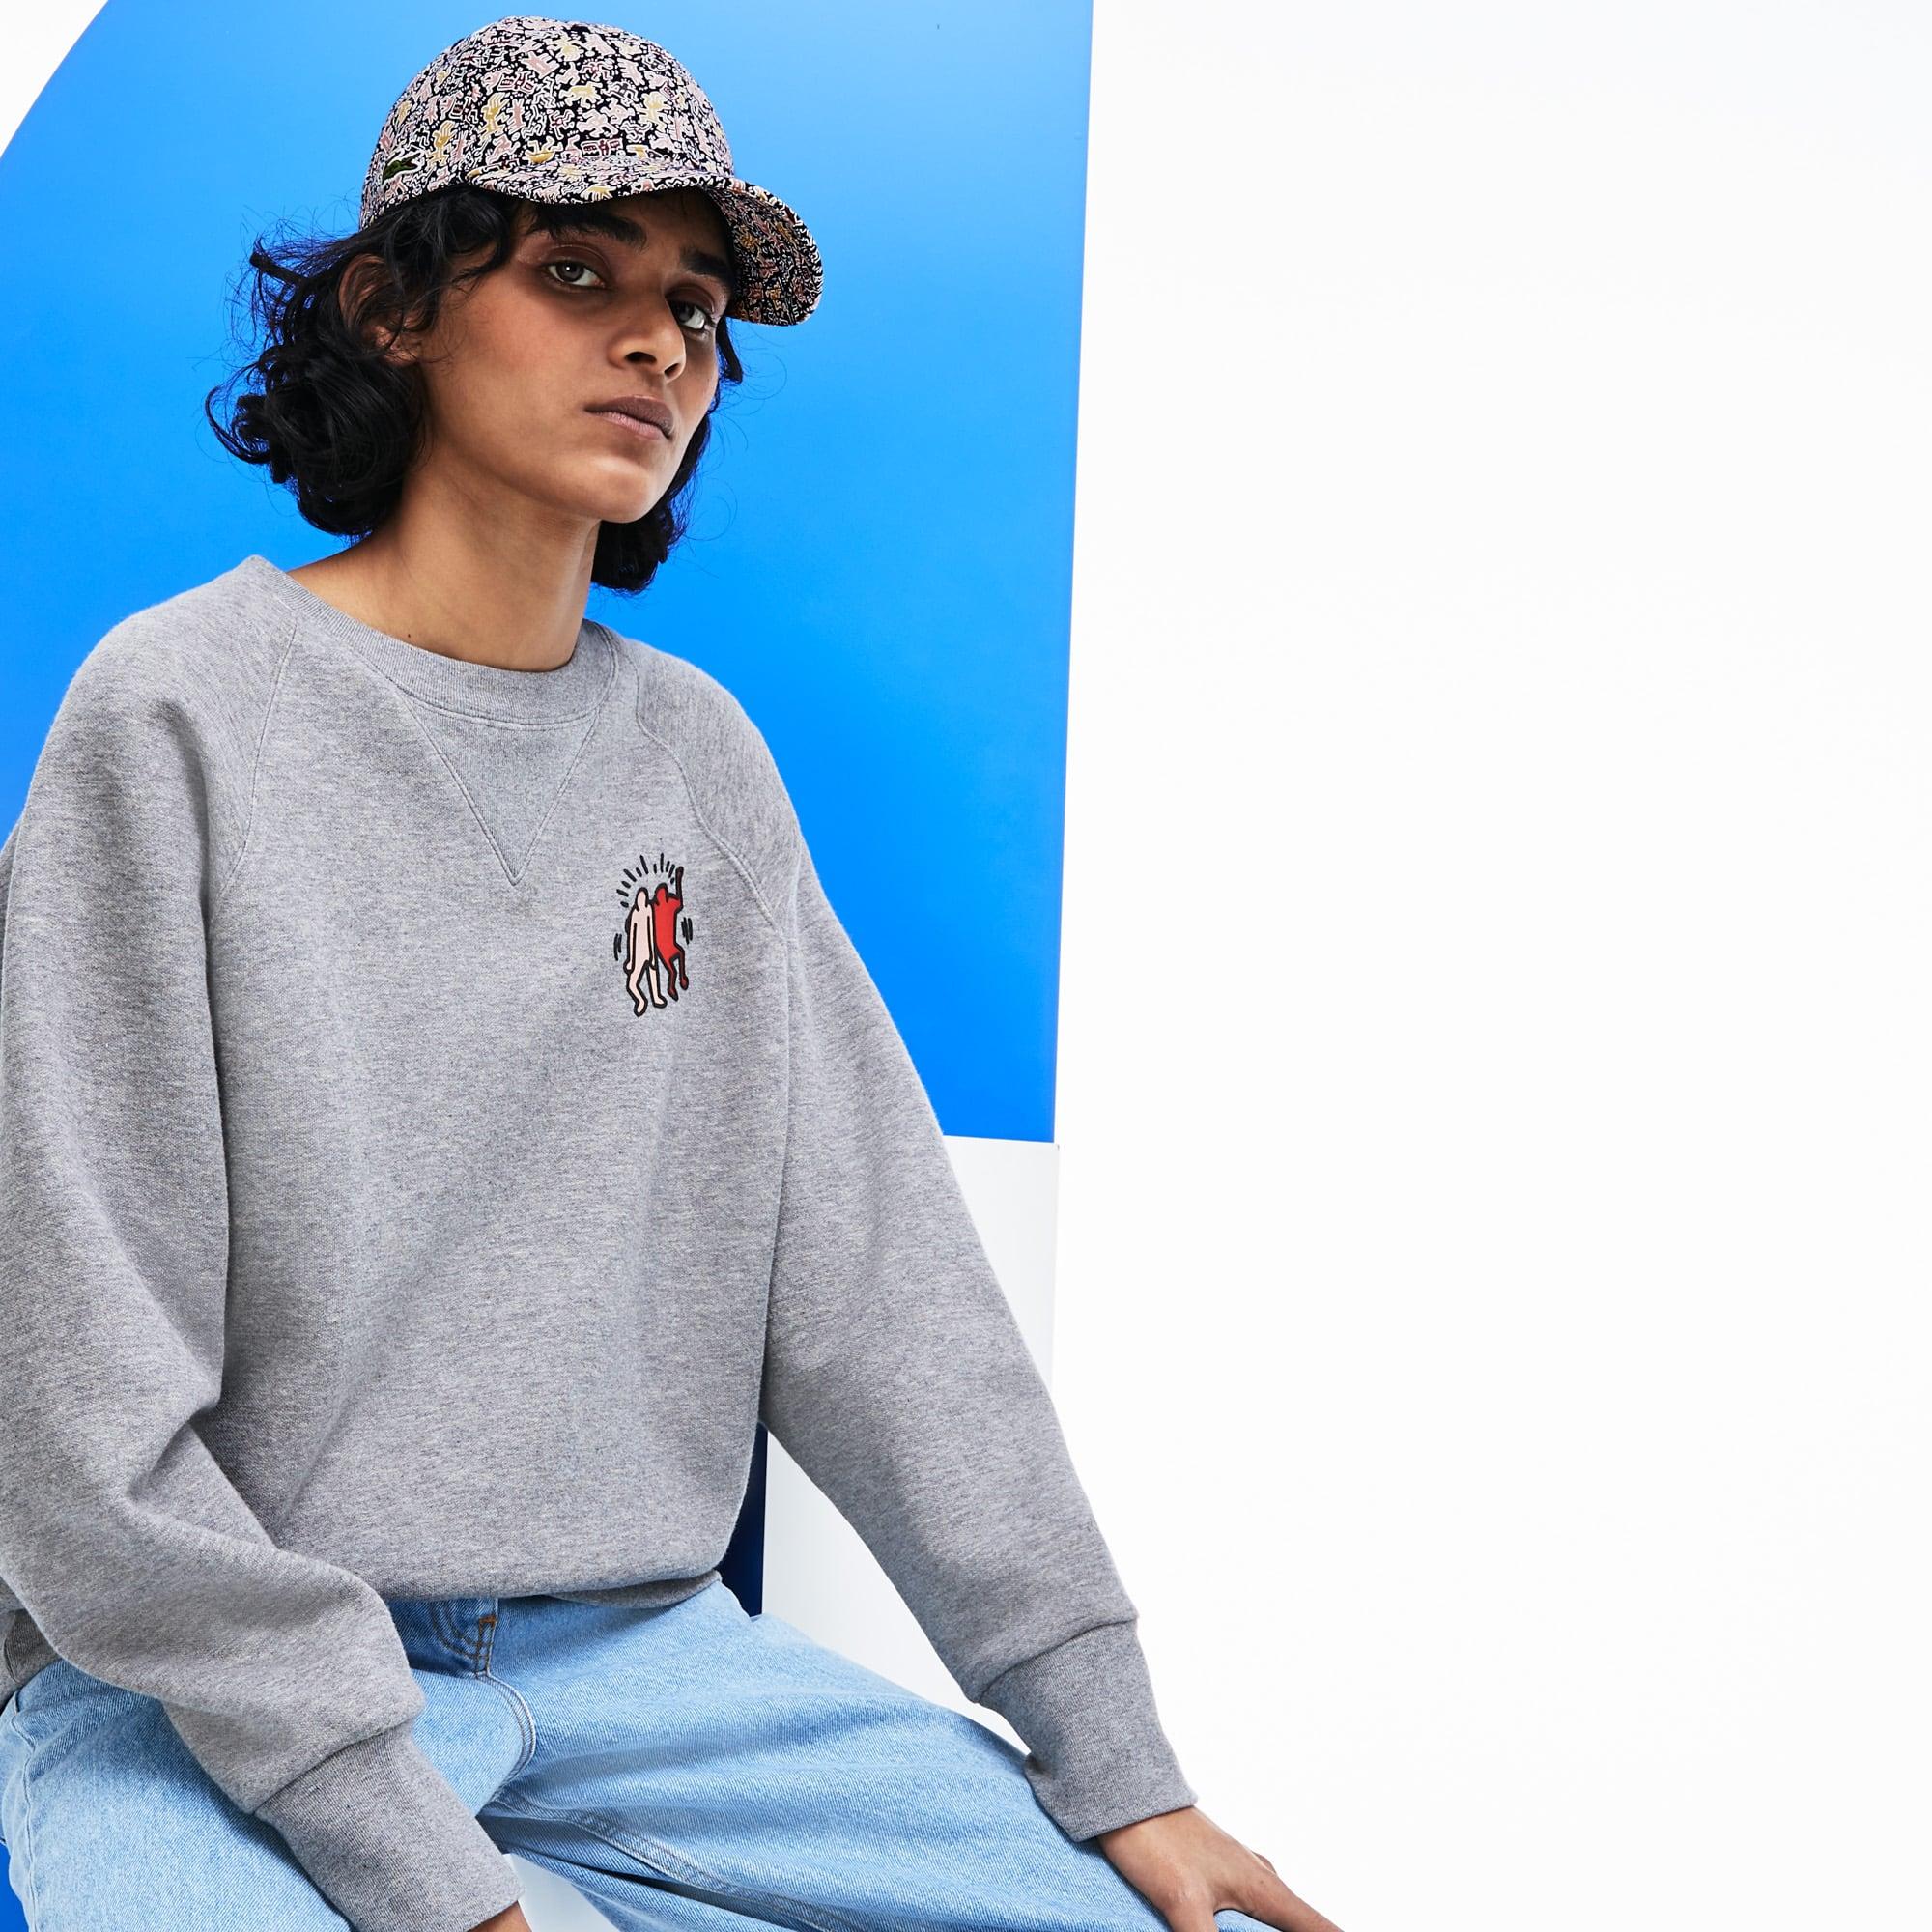 7ad22986 Women's Keith Haring Print Cotton Cap